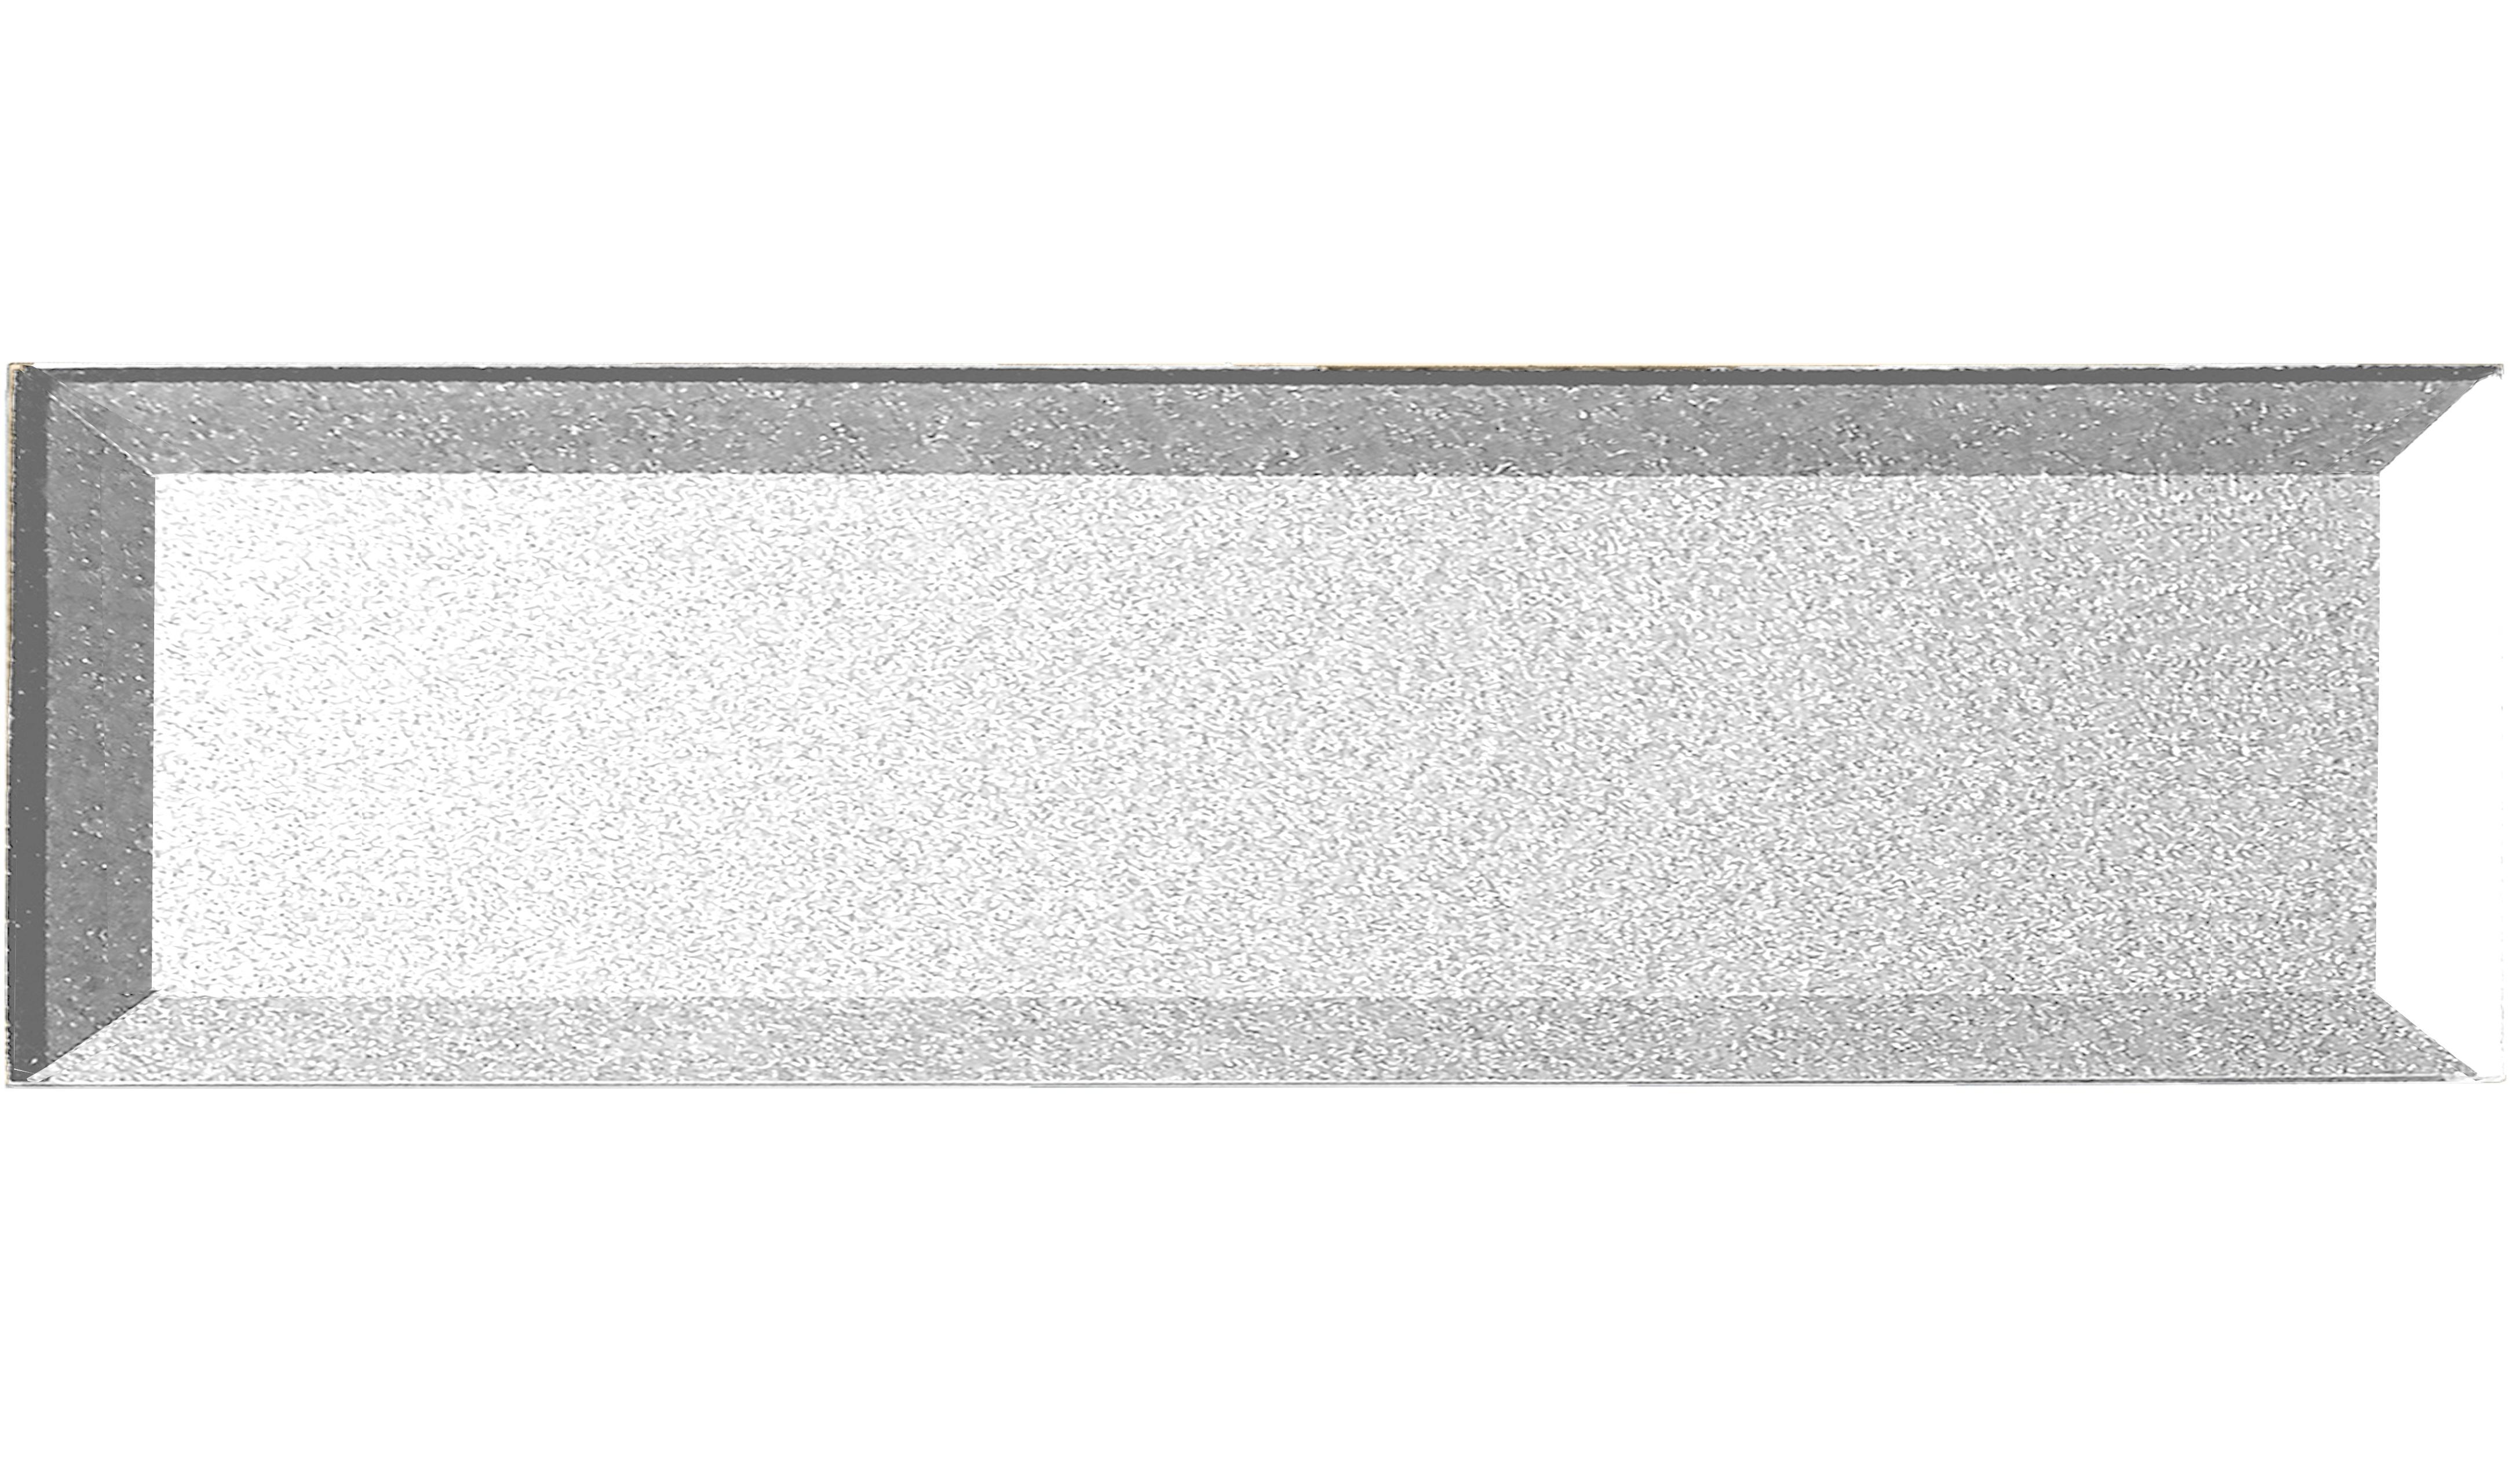 "Forever 4"" x 16"" Beveled Silver Glass Subway Backsplash Wall Tile"